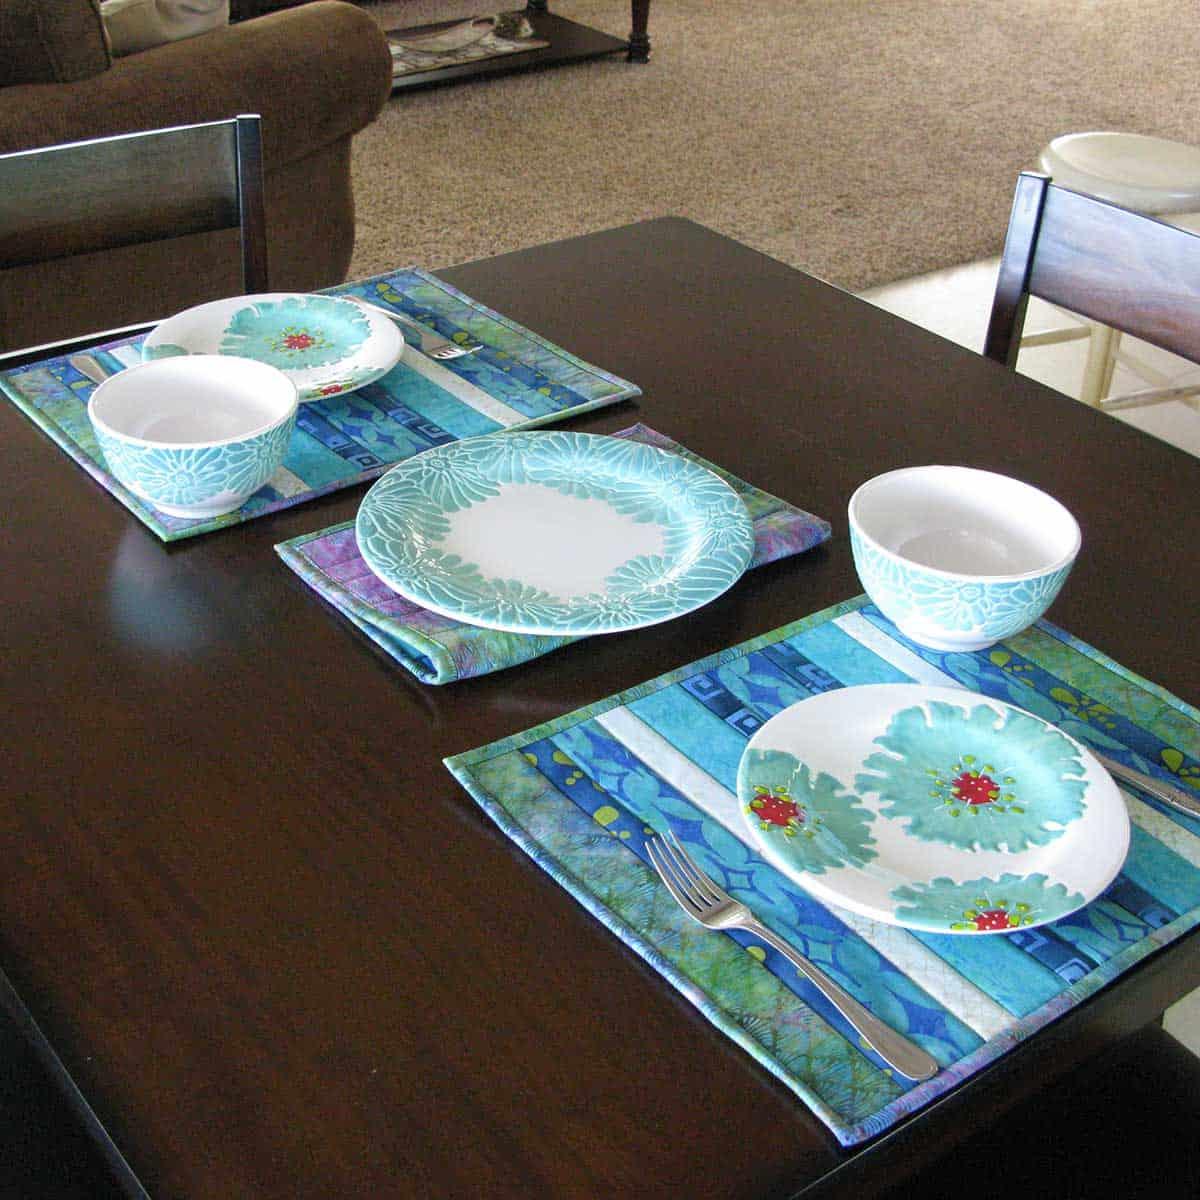 QAYG Island Batik Placemats table